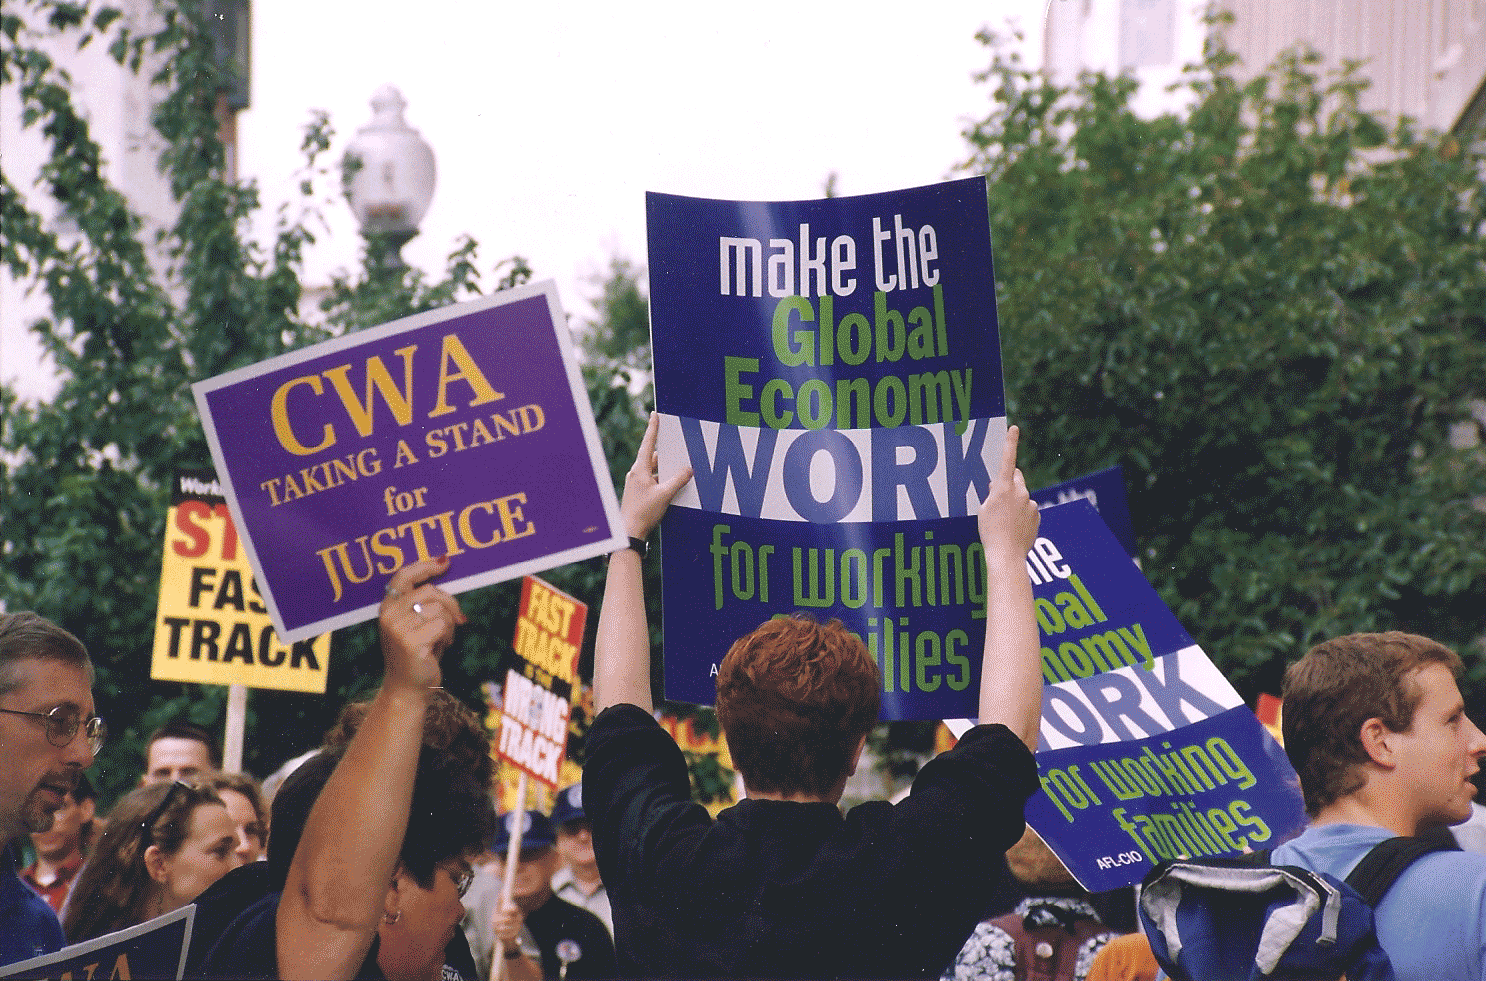 31 Cwa Throwback Thursday Ideas Throwback Thursday Throwback History